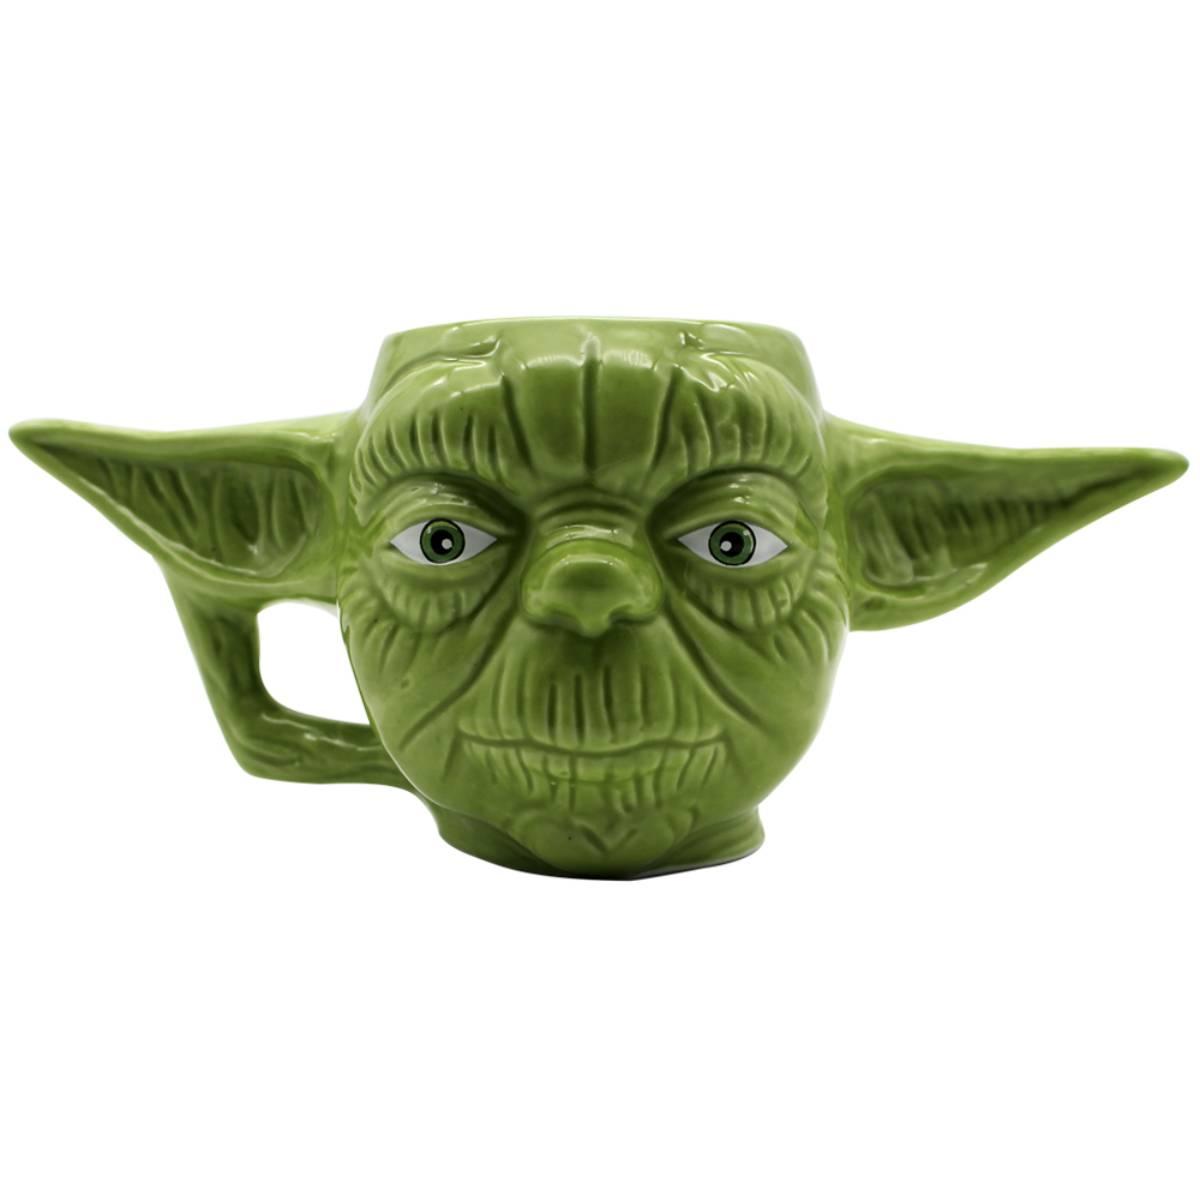 Caneca 3D Yoda Mestre Jedi Star Wars Guerra nas Estrelas